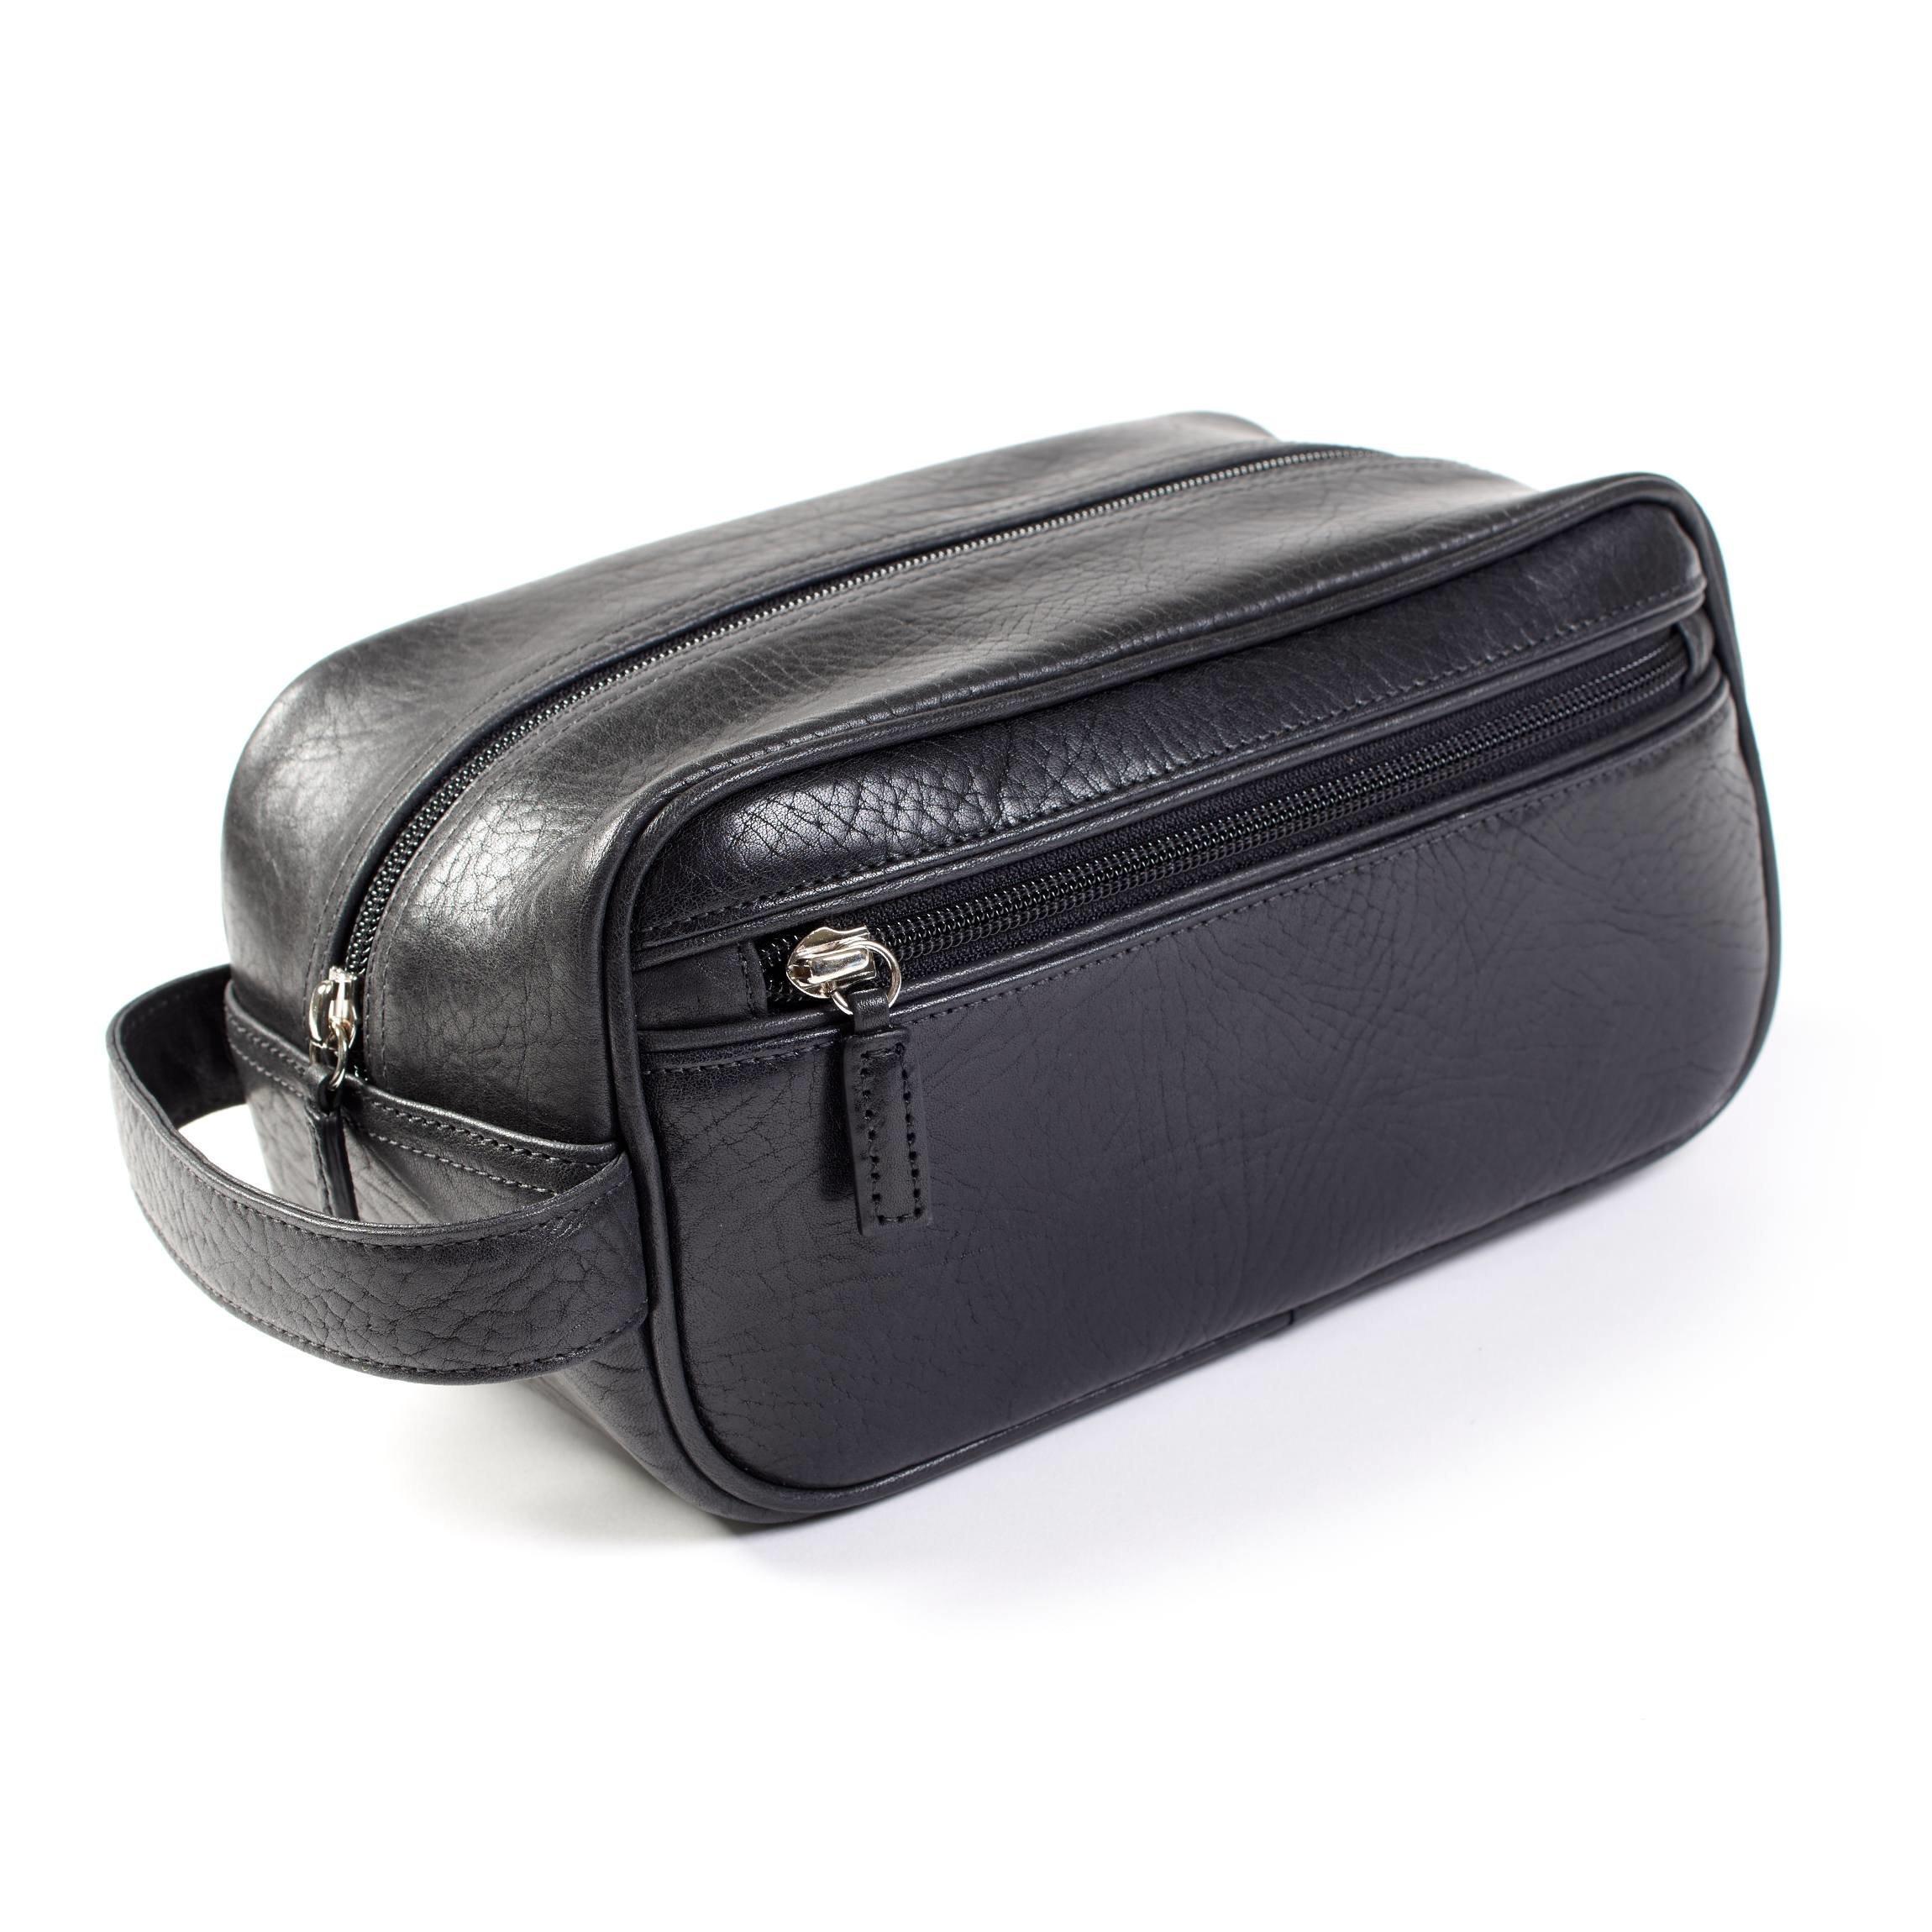 Leatherology Small Shave Toiletry Bag - Italian Leather - Ebony (black)